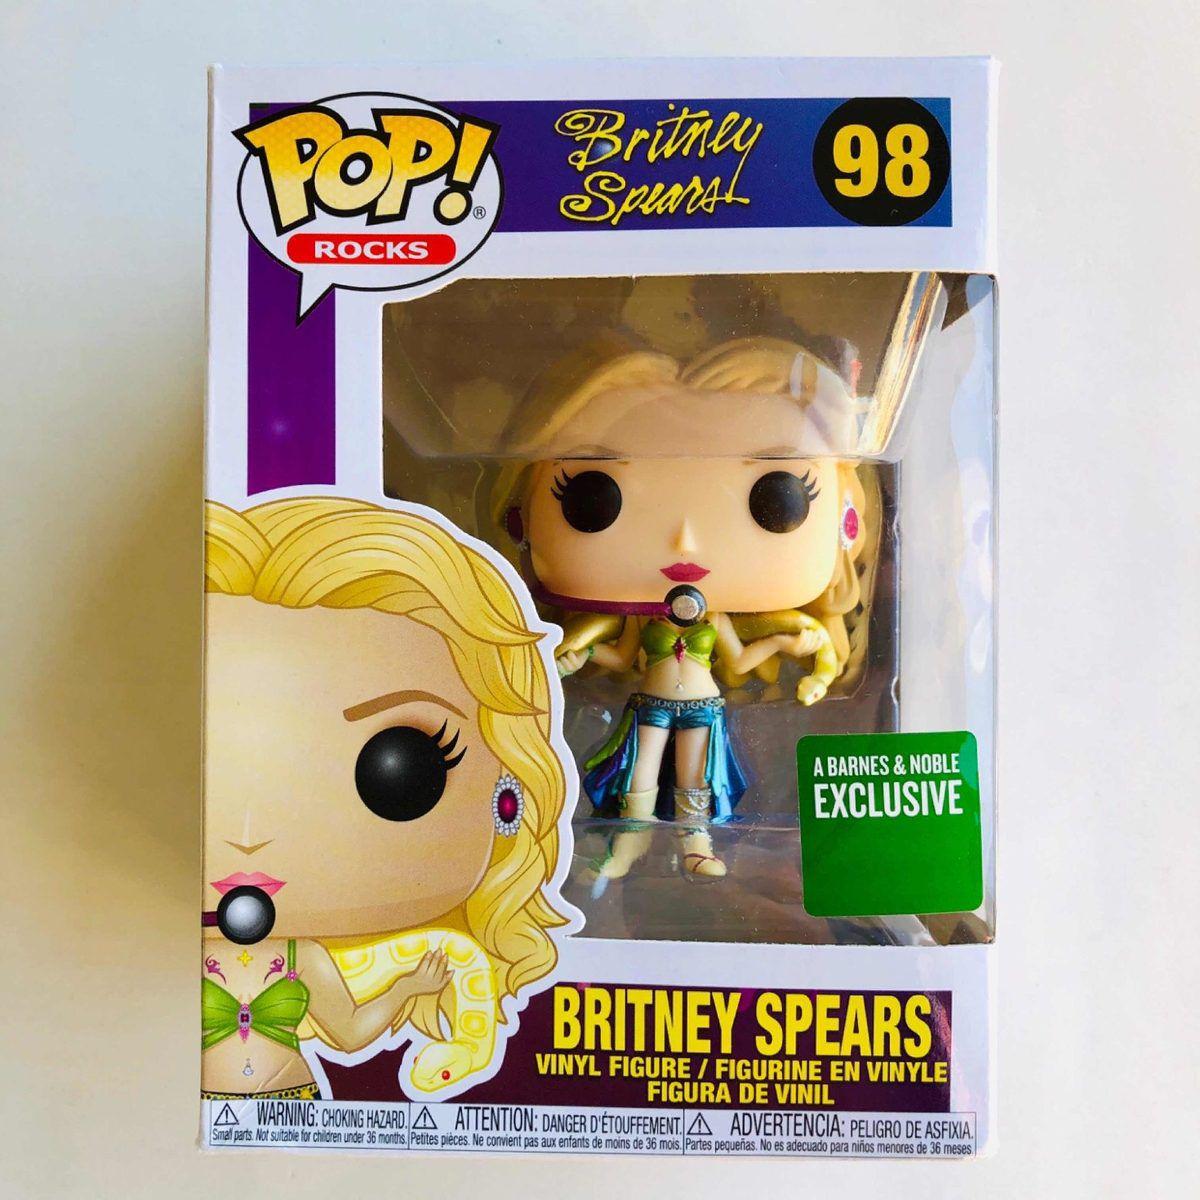 Funko Pop Britney Spears Pintura Metálica Eclusiva Barnes Noble  - Game Land Brinquedos